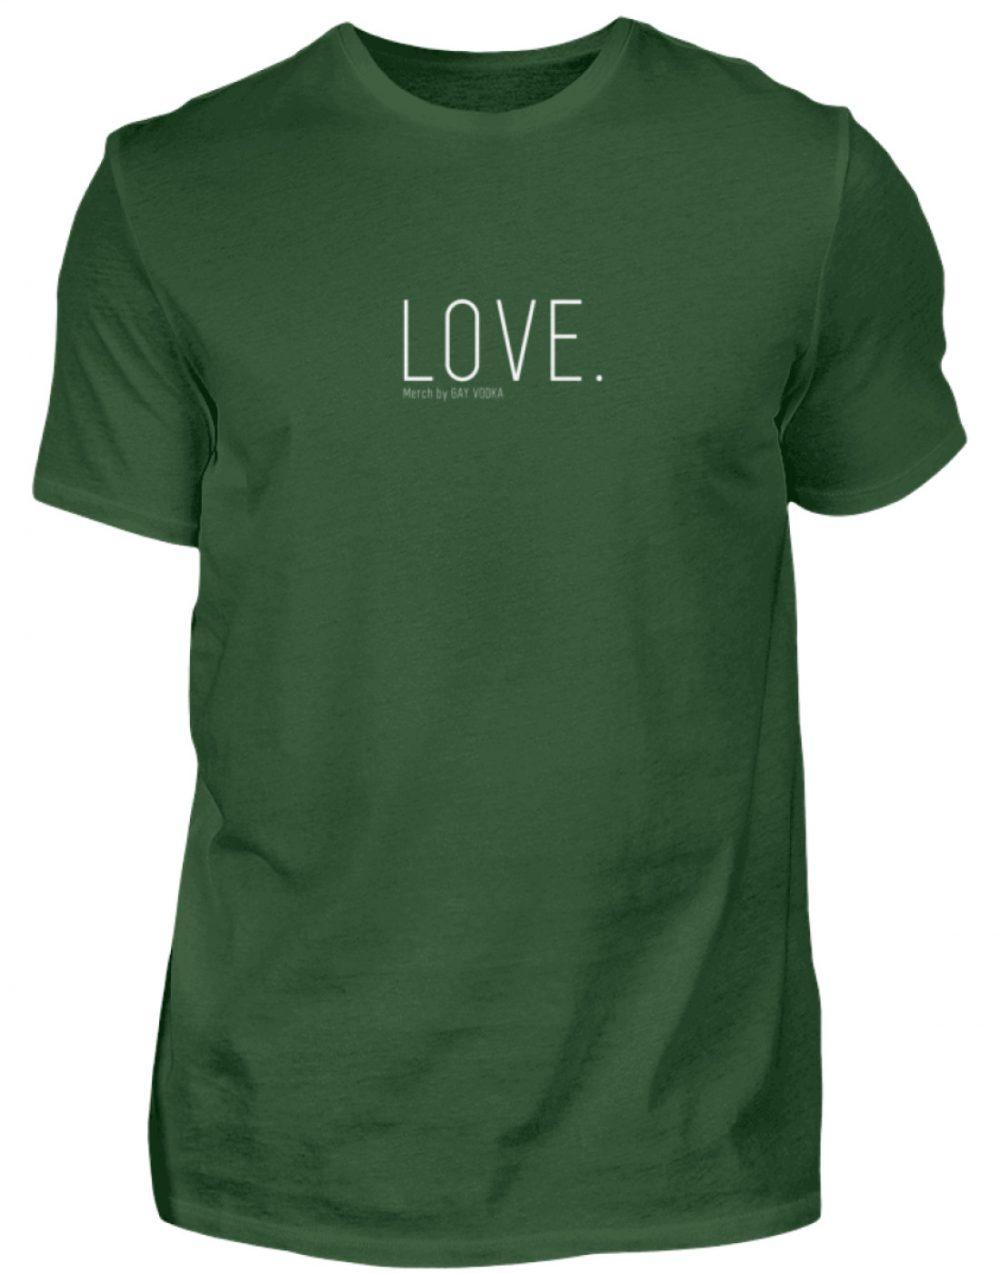 LOVE. - Herren Premiumshirt-2936